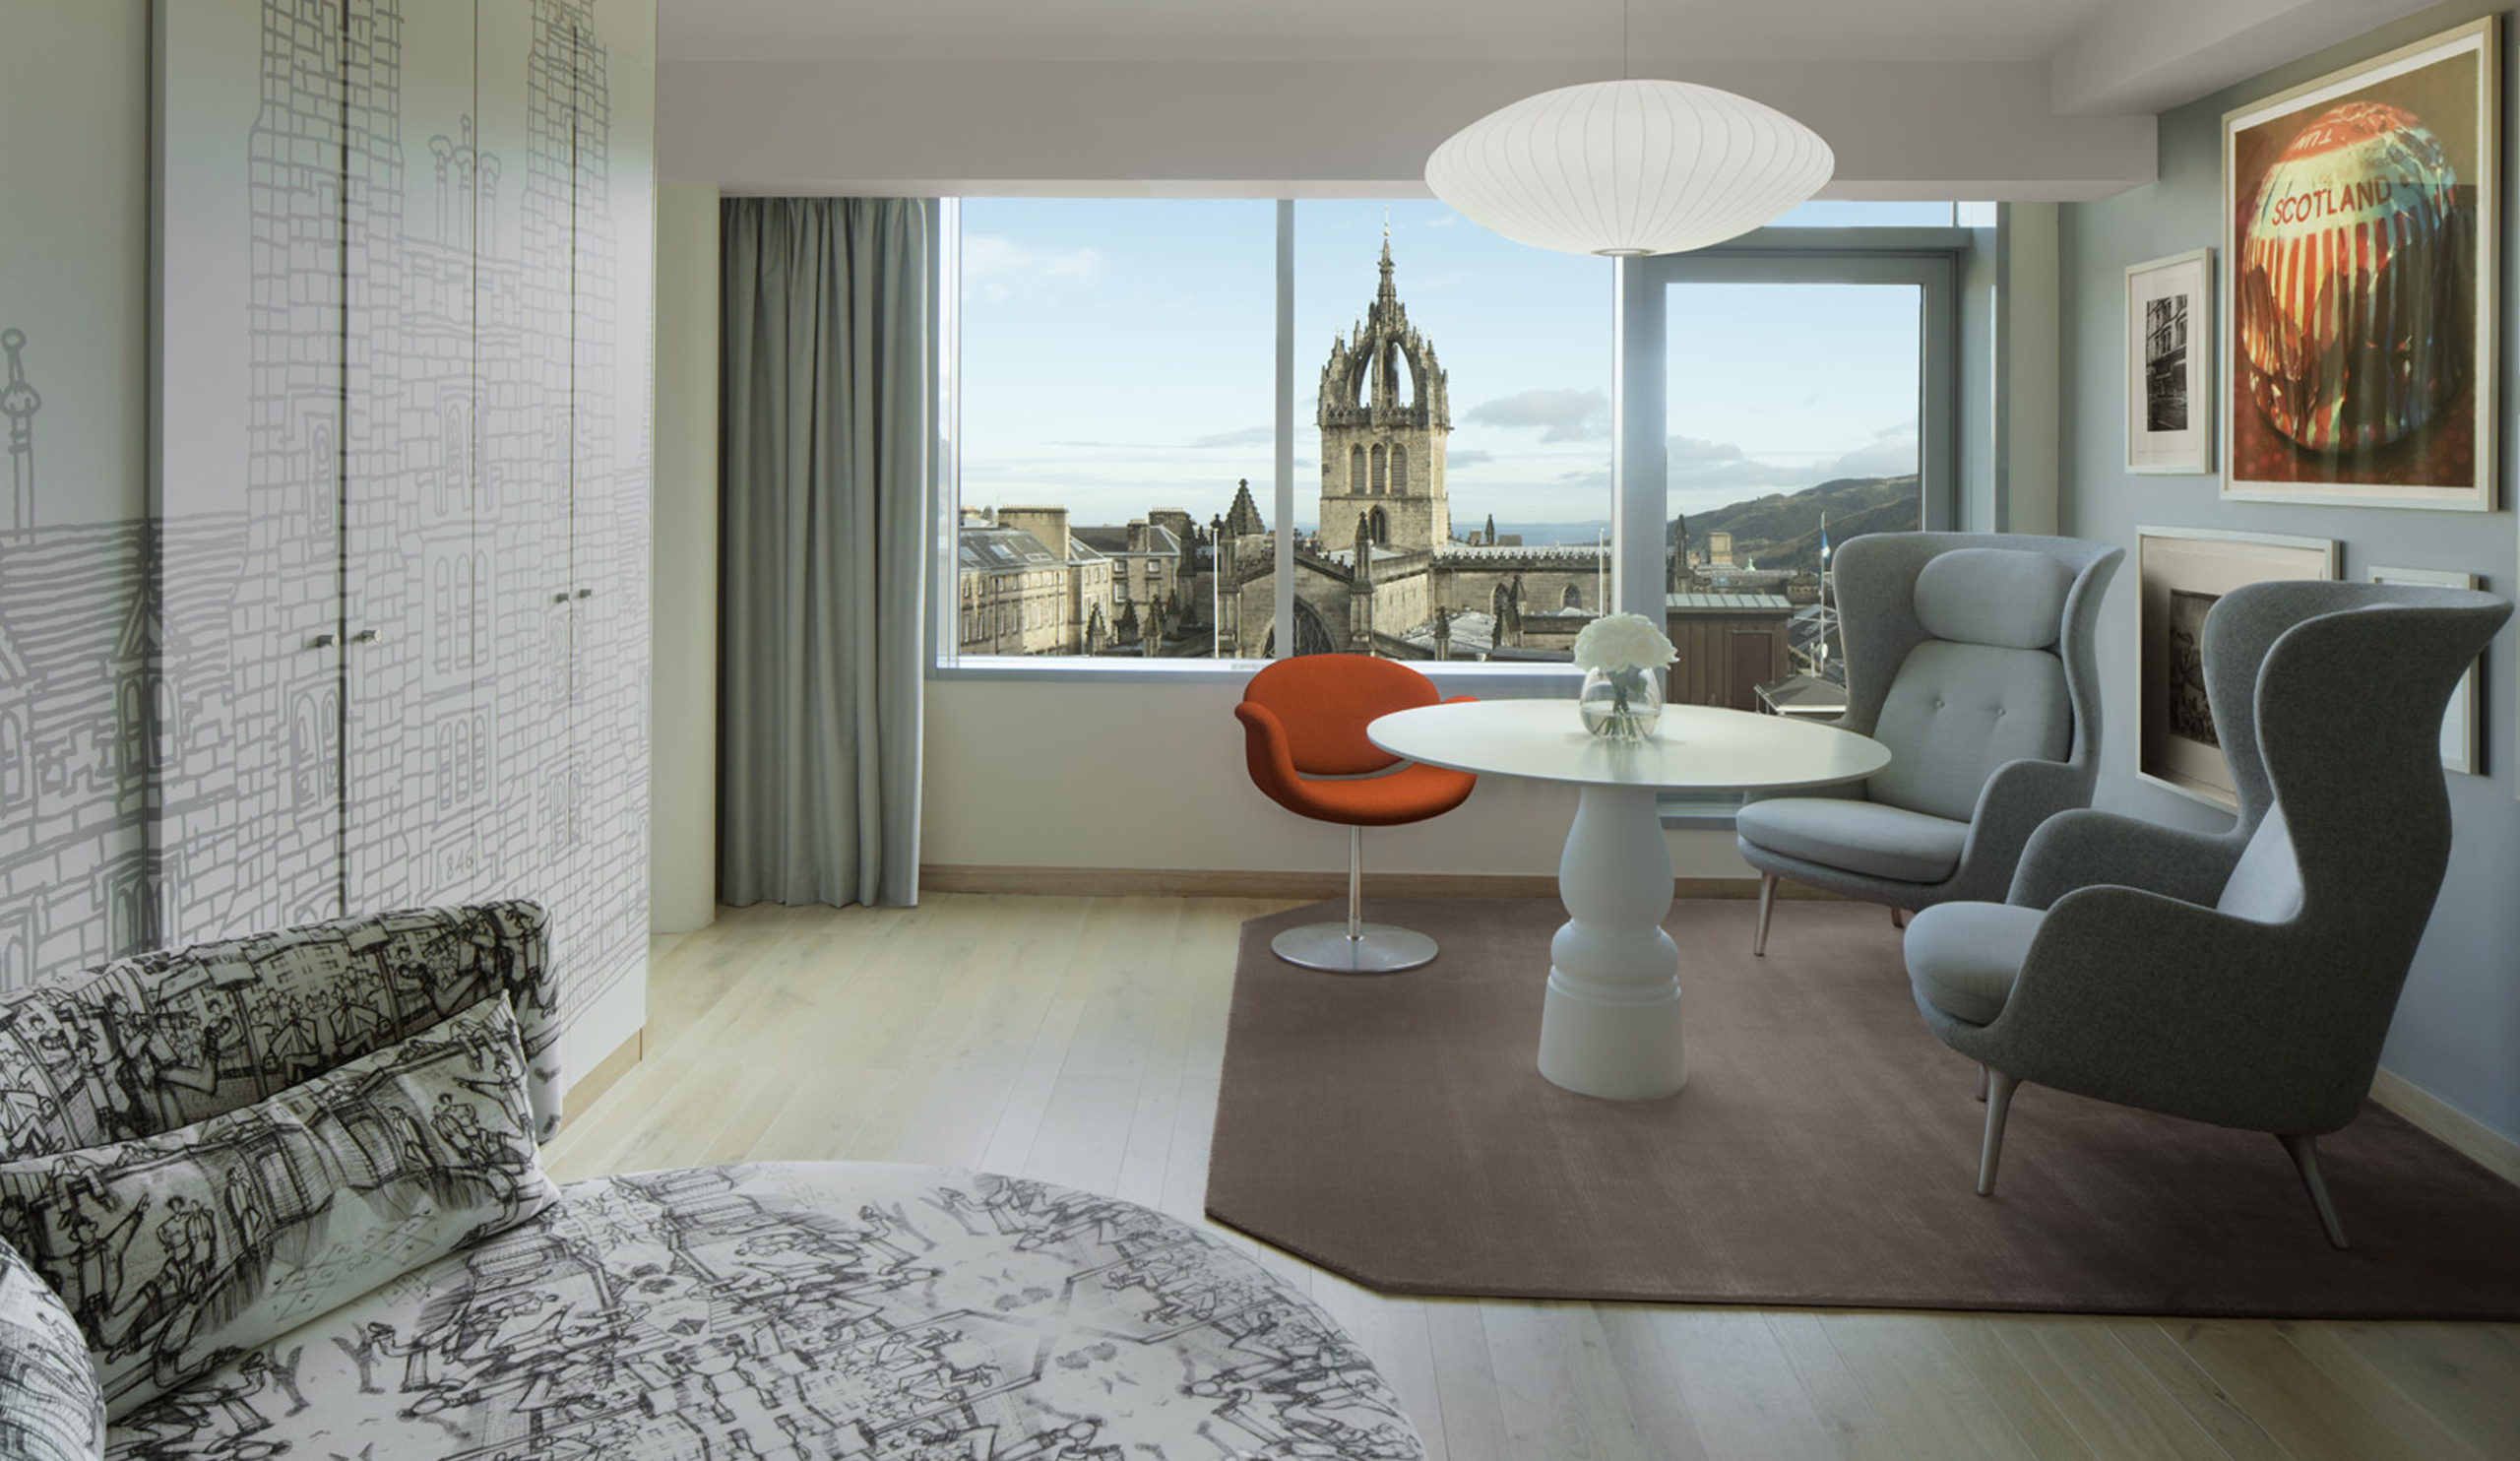 g-and-v-hotel-suite-edinburgh